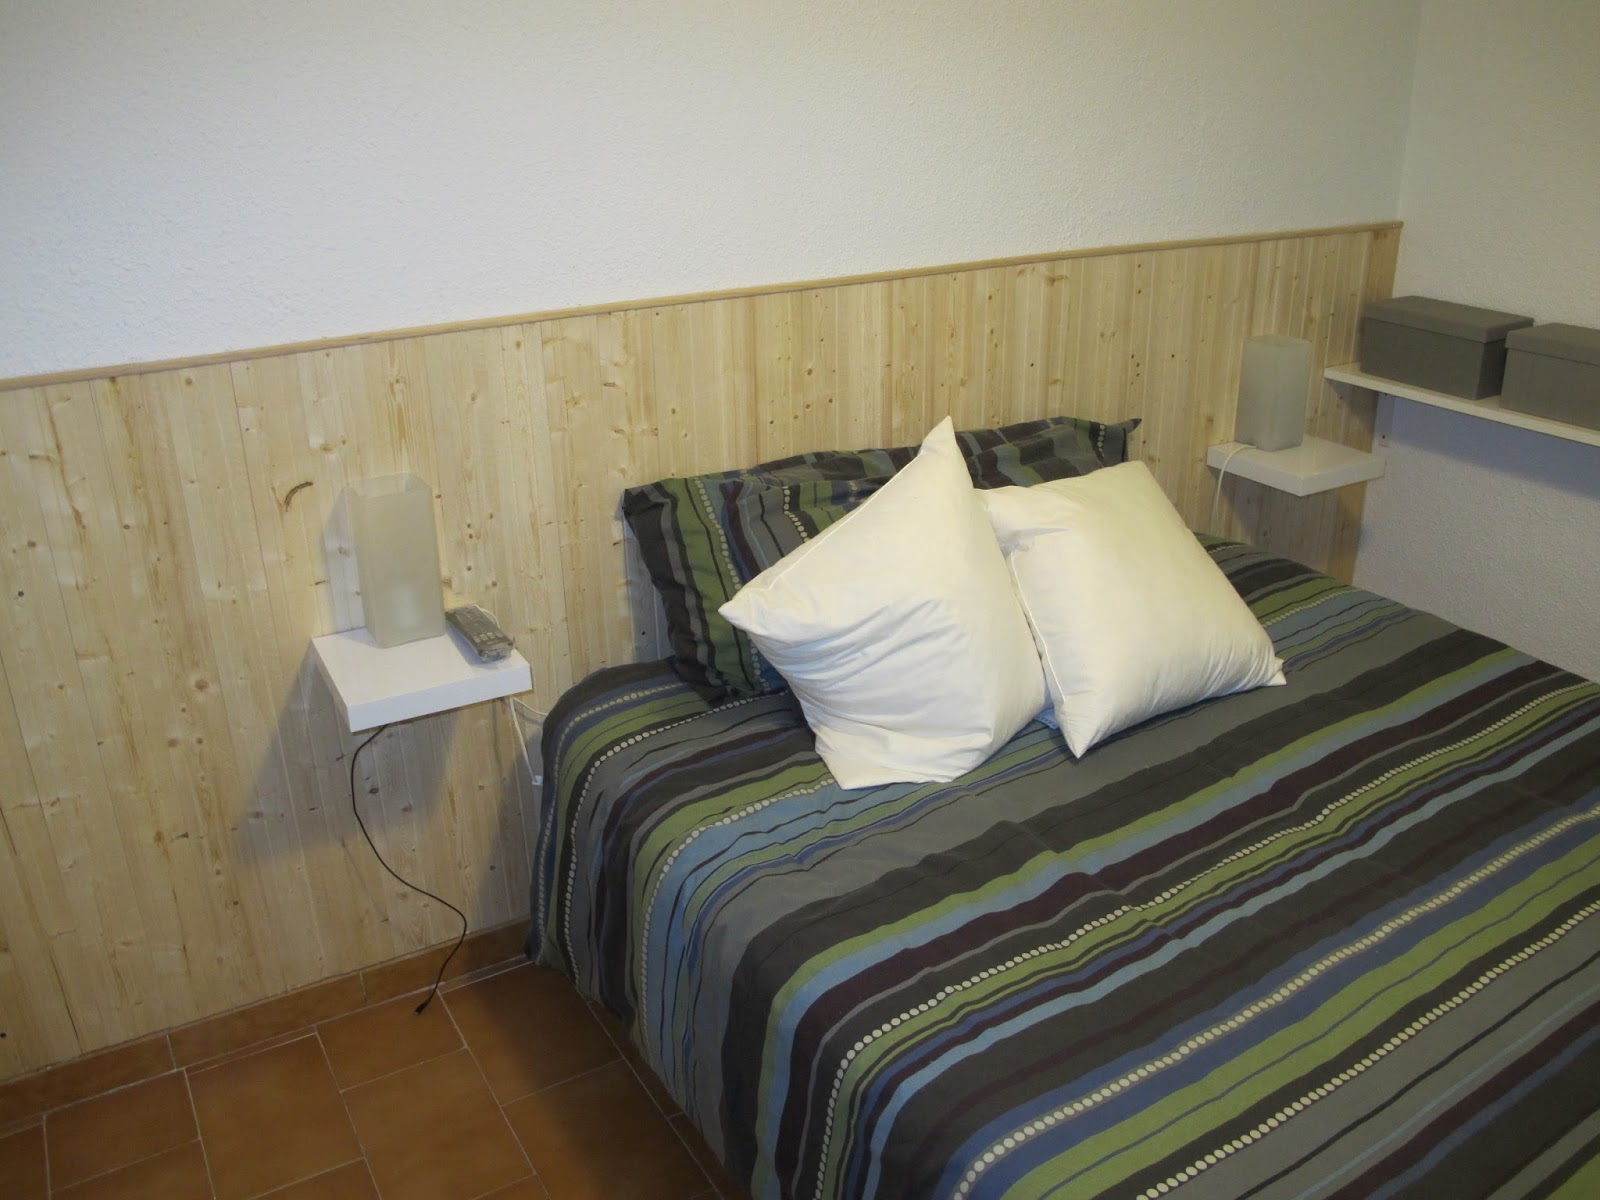 Bricomonxo cabecero de madera para dormitorio - Habitacion de madera ...